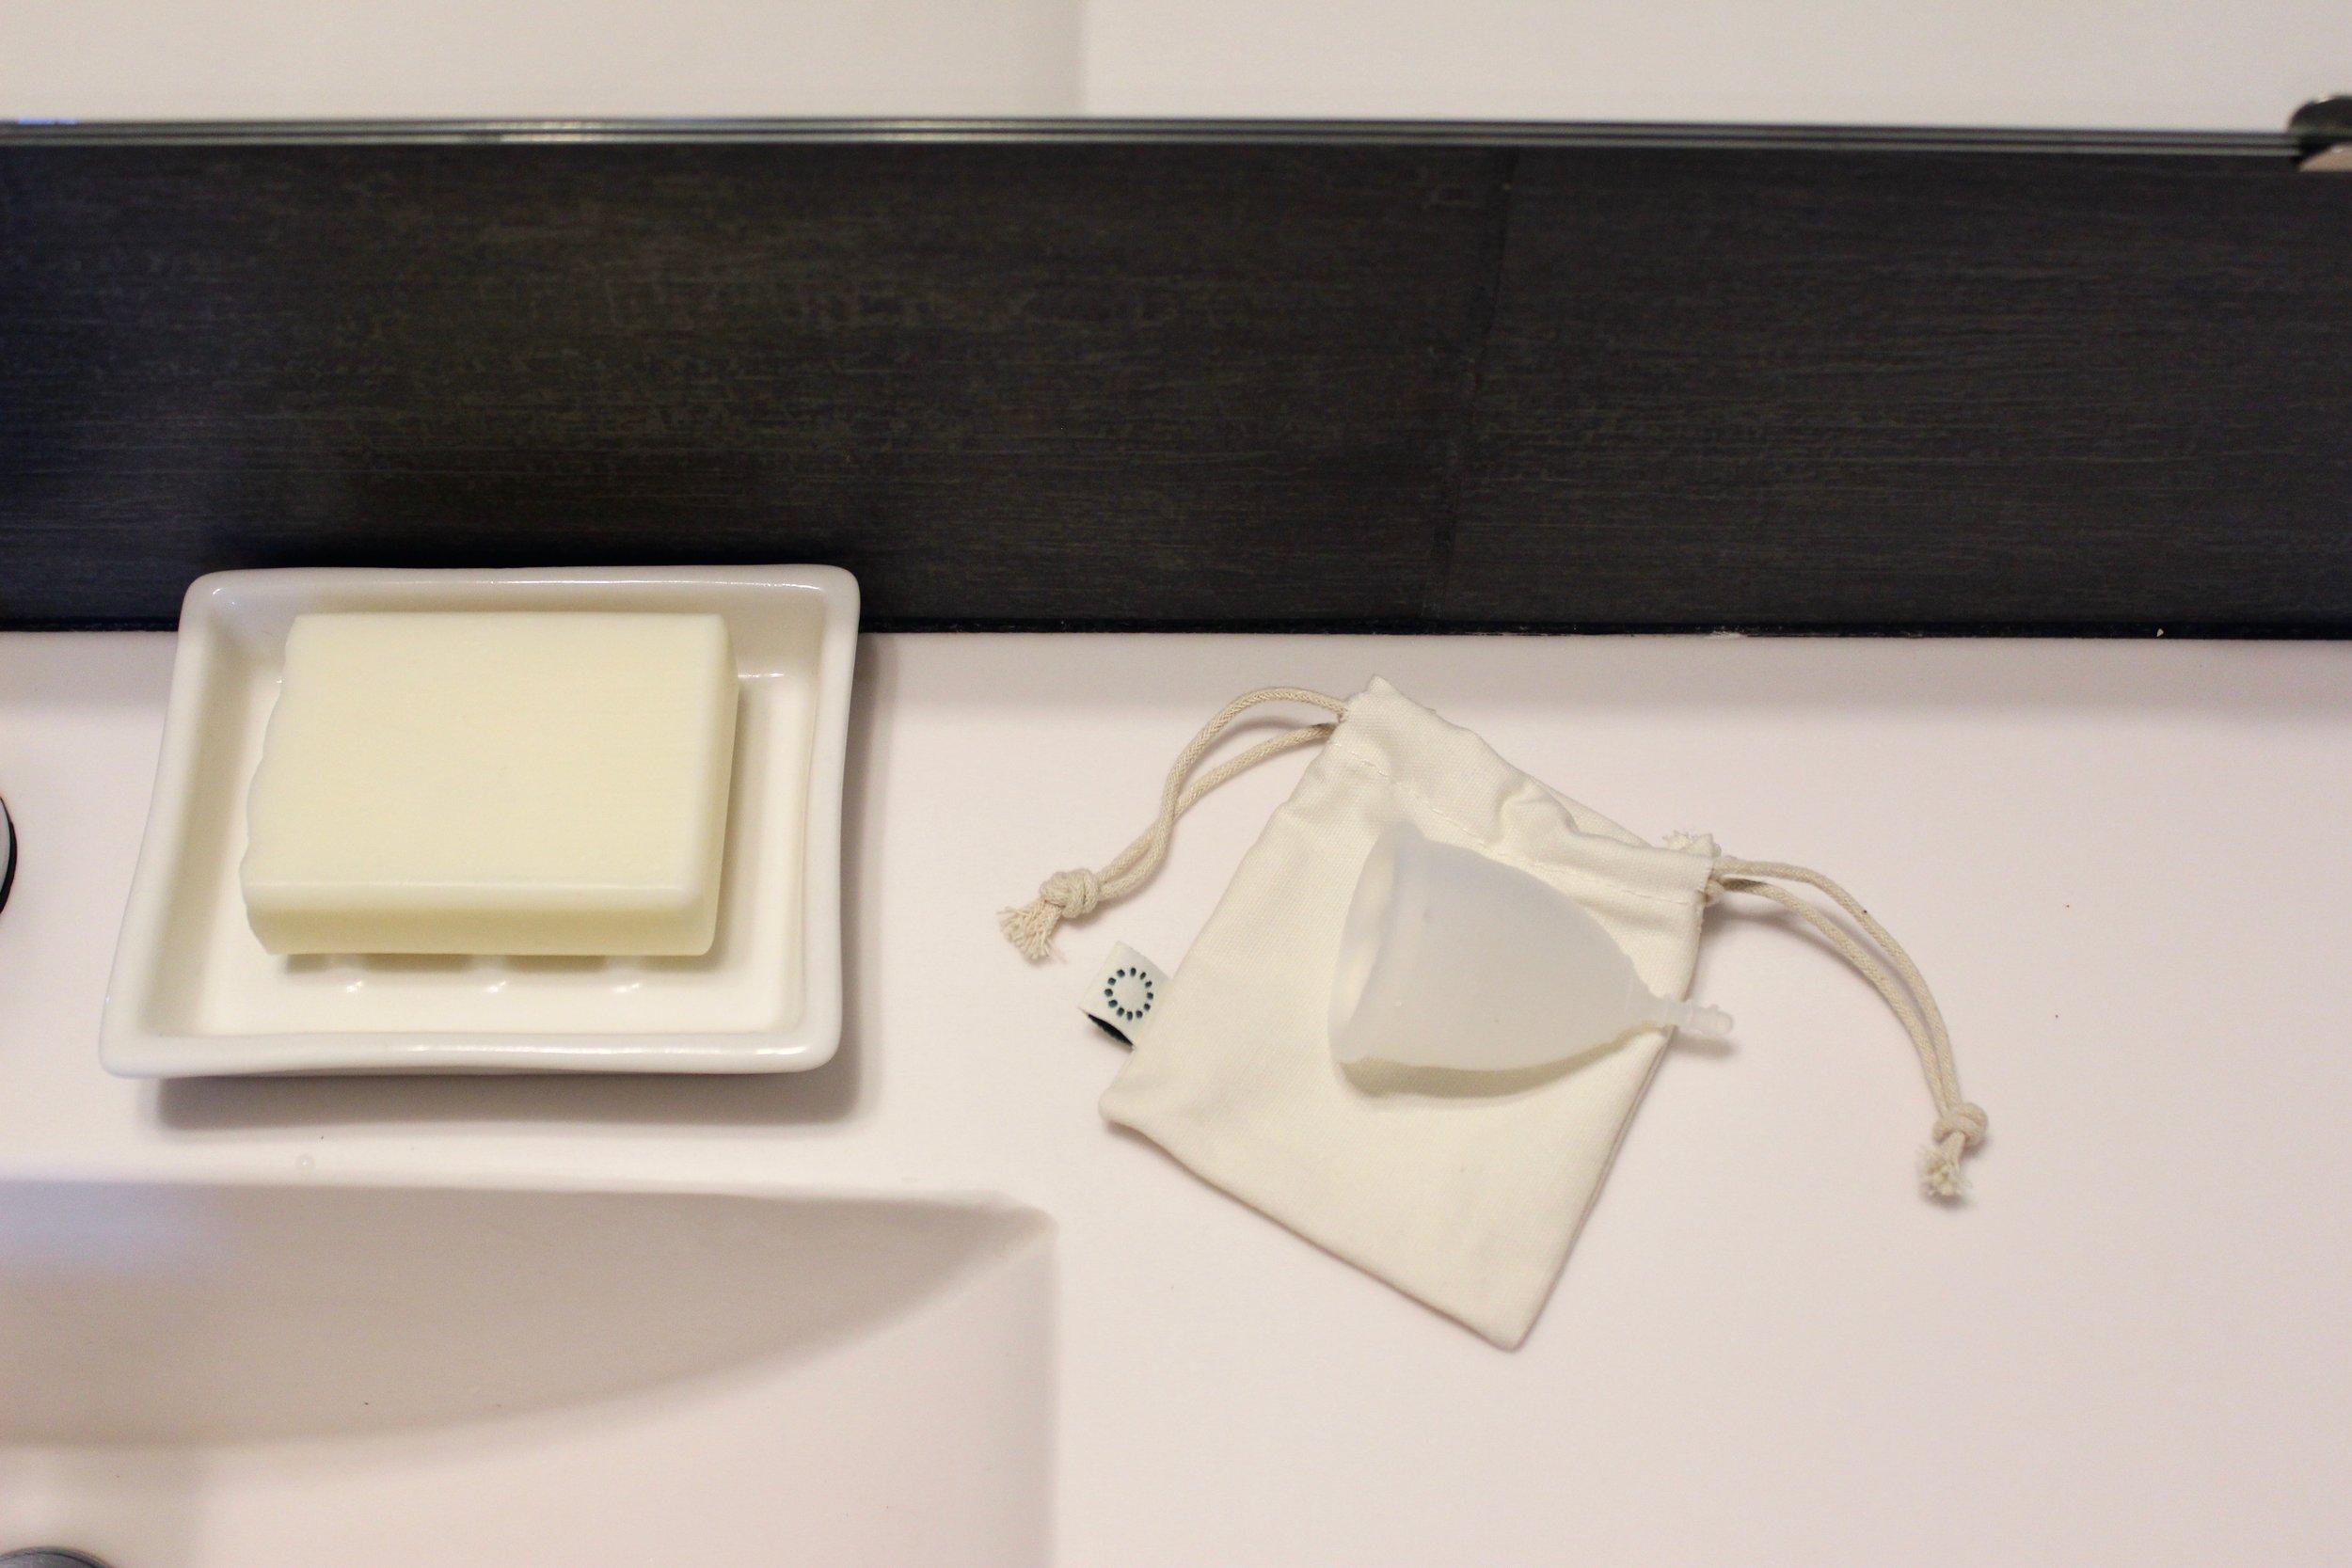 OrganiCup zero waste menstrual cup | Litterless